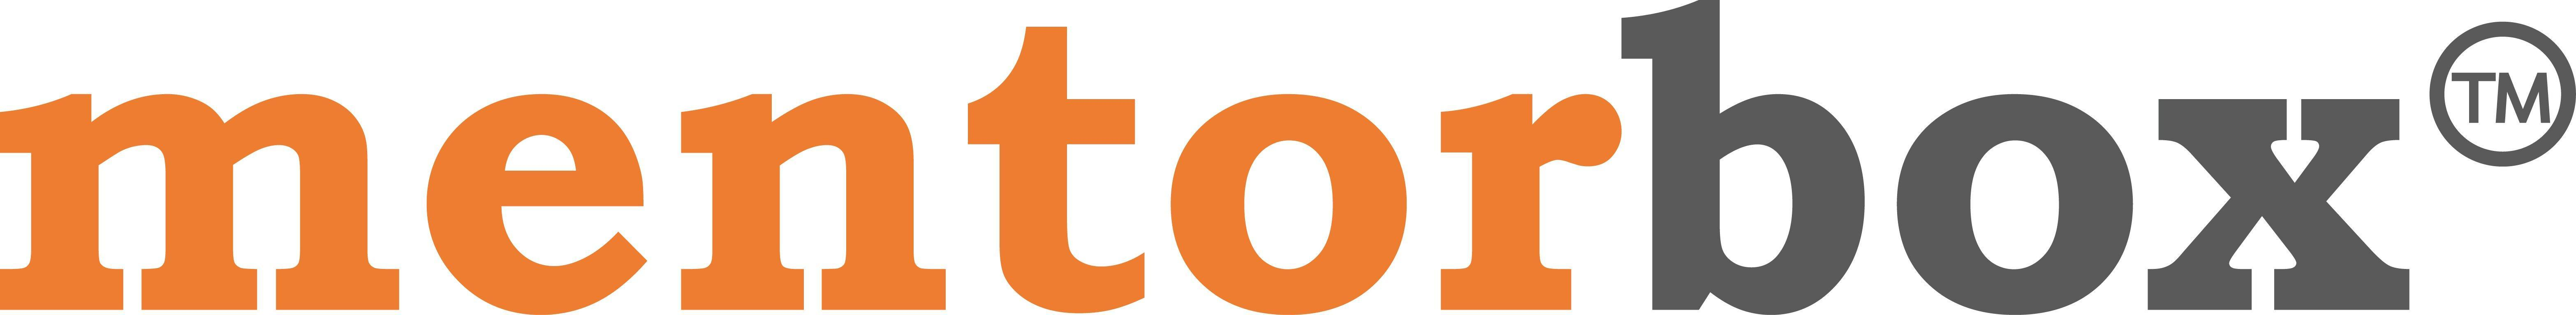 Mentorbox company logo